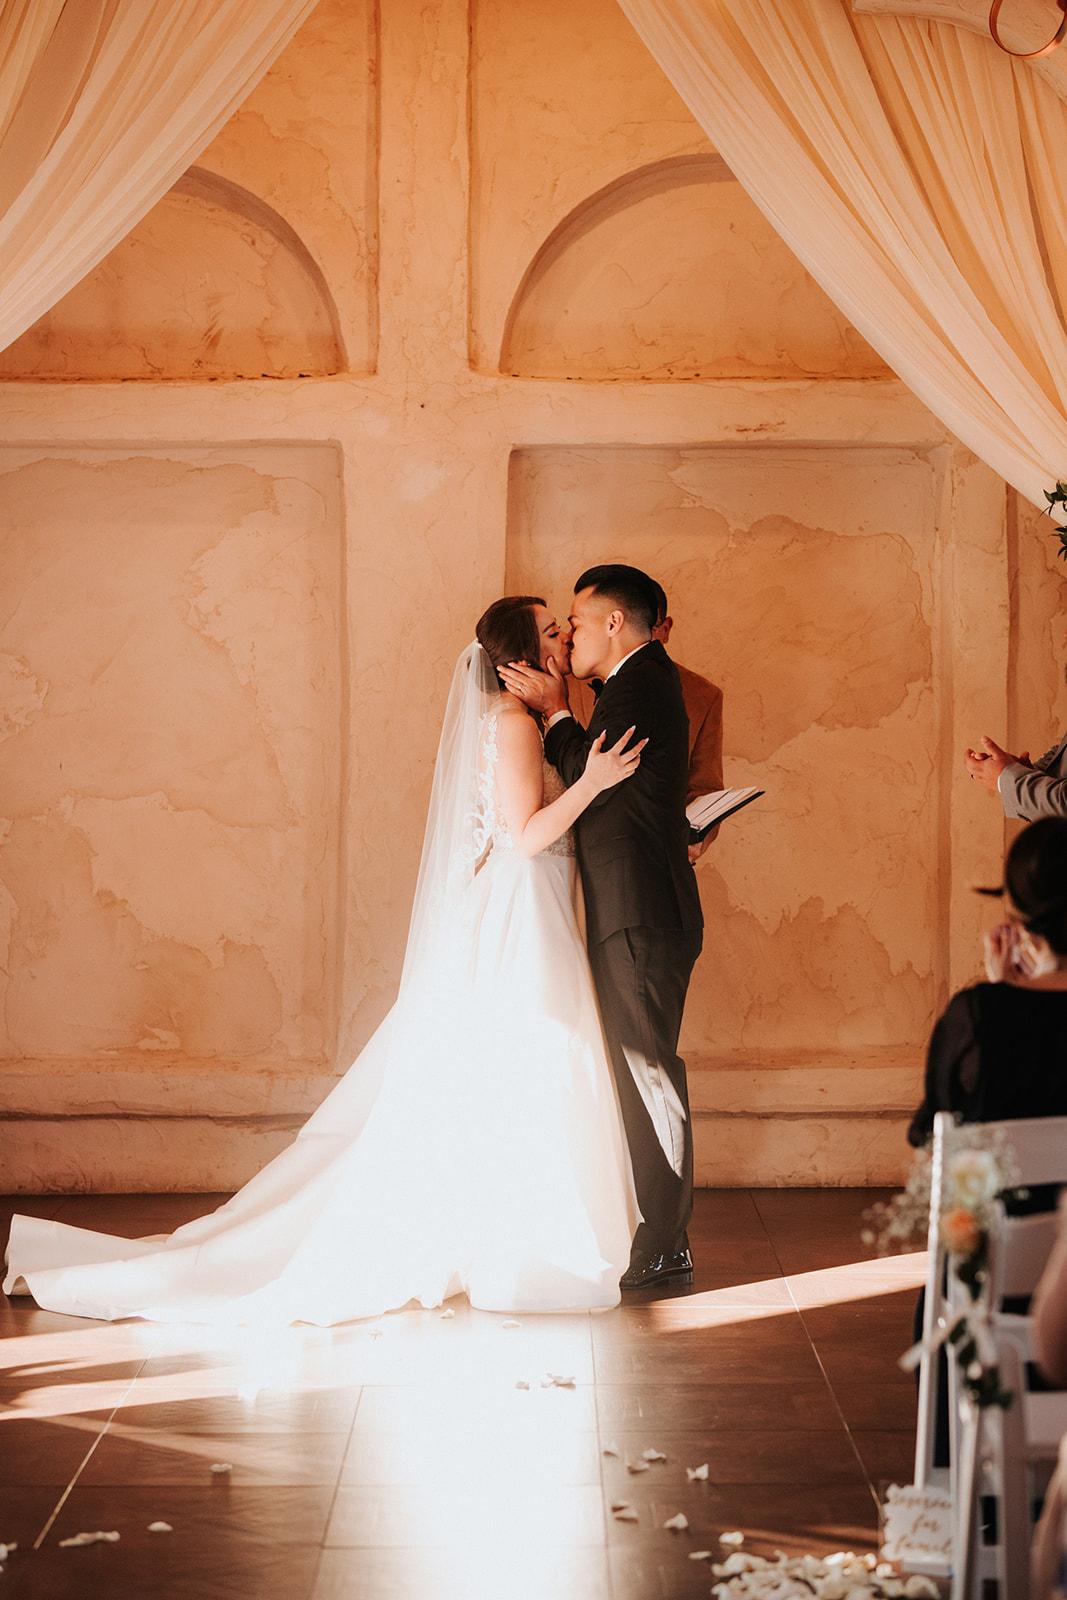 Jessica_+_JD_Wedding_-_Diana_Ascarrunz_Photography-471.jpg